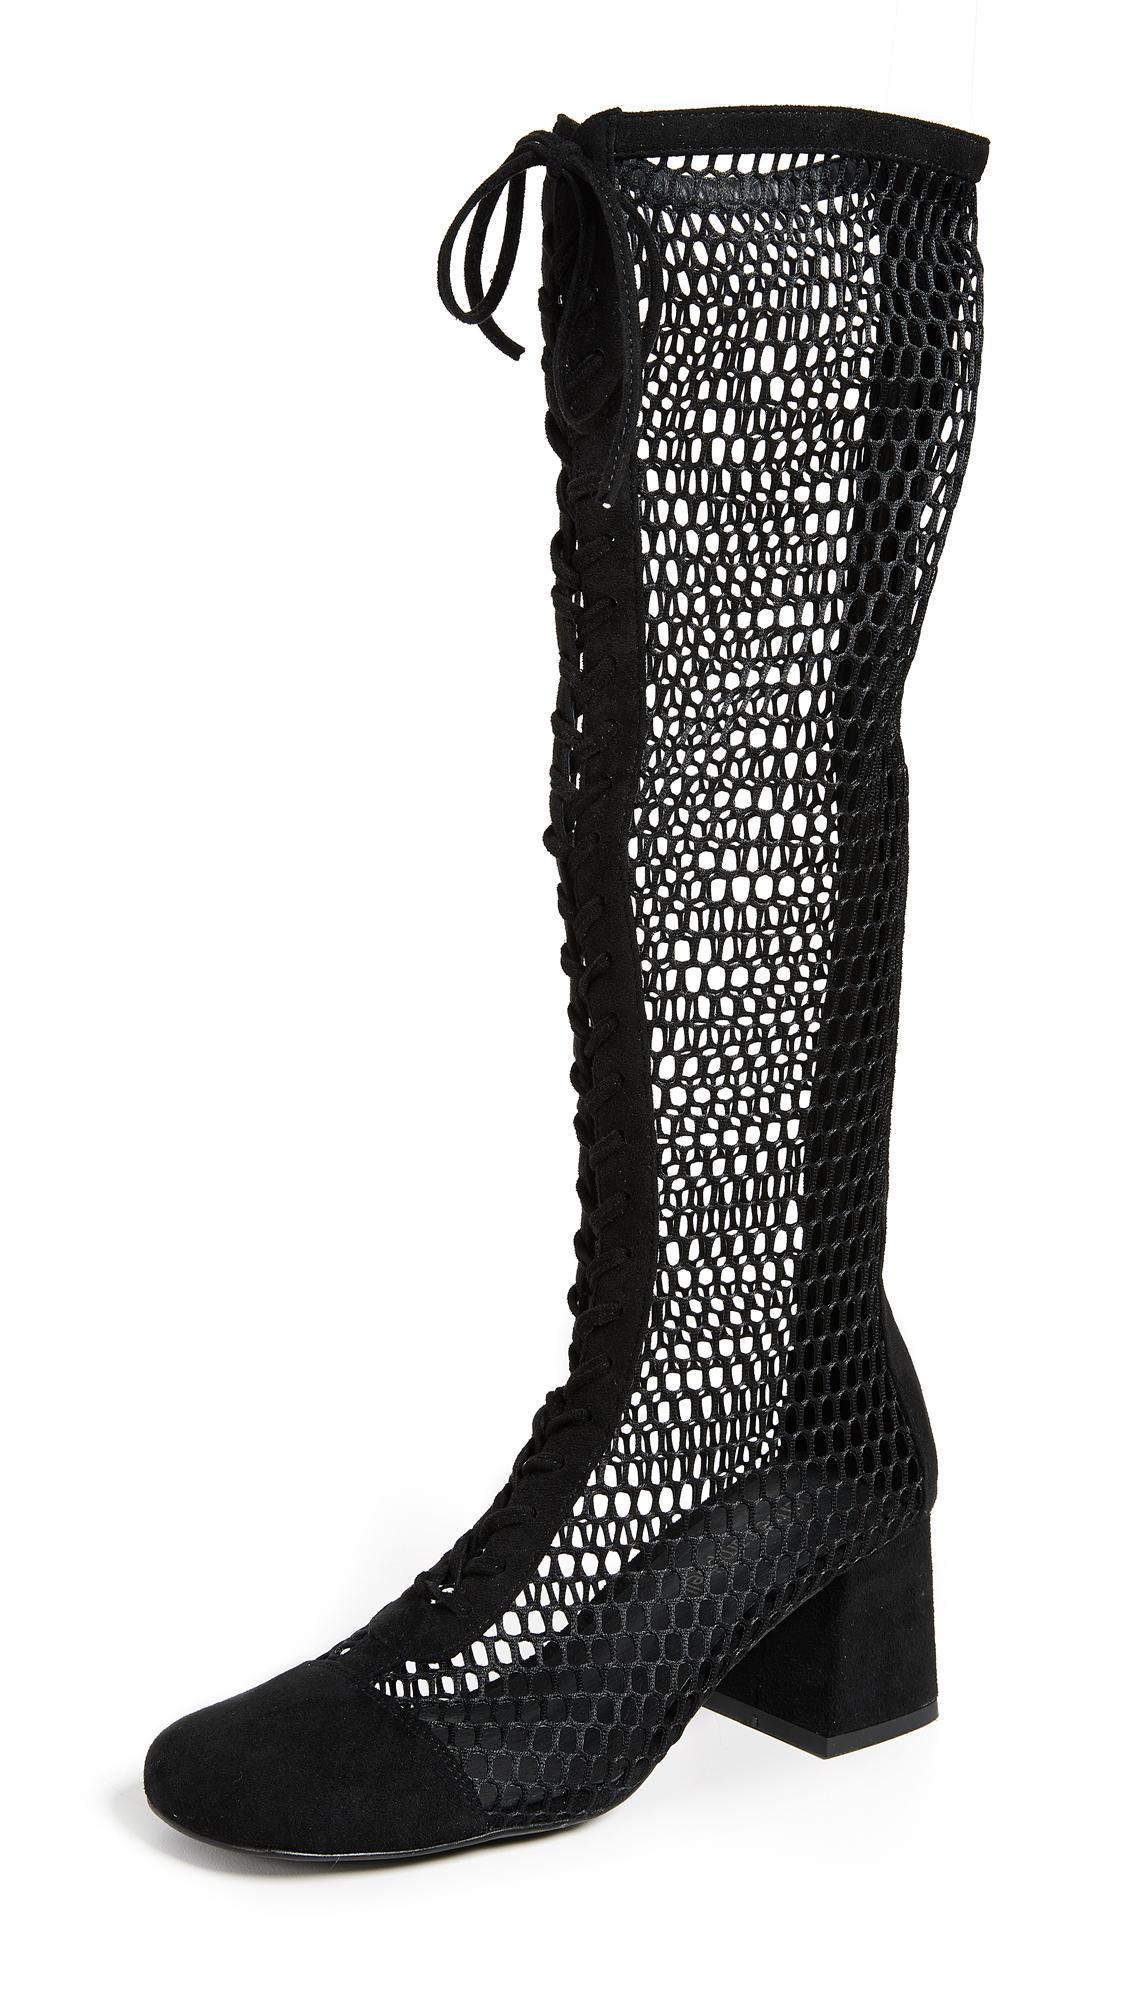 Jeffrey Campbell Diviner Boots - Black